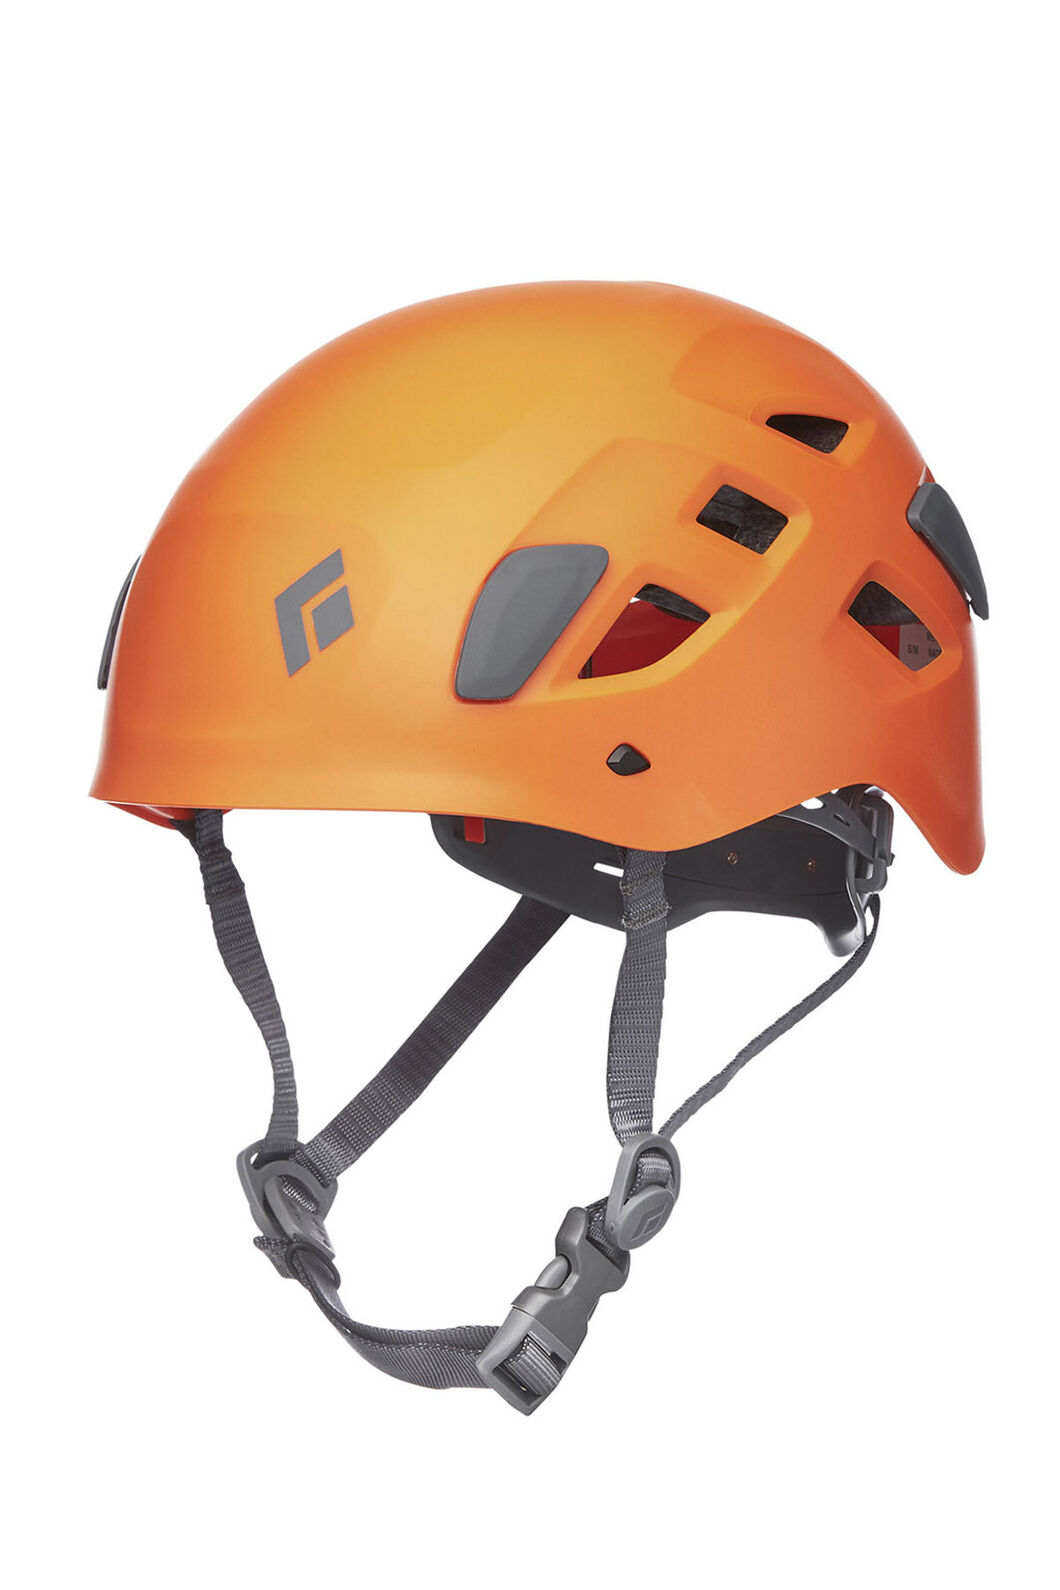 Black Diamond Half Dome Helmet, Orange, hi-res